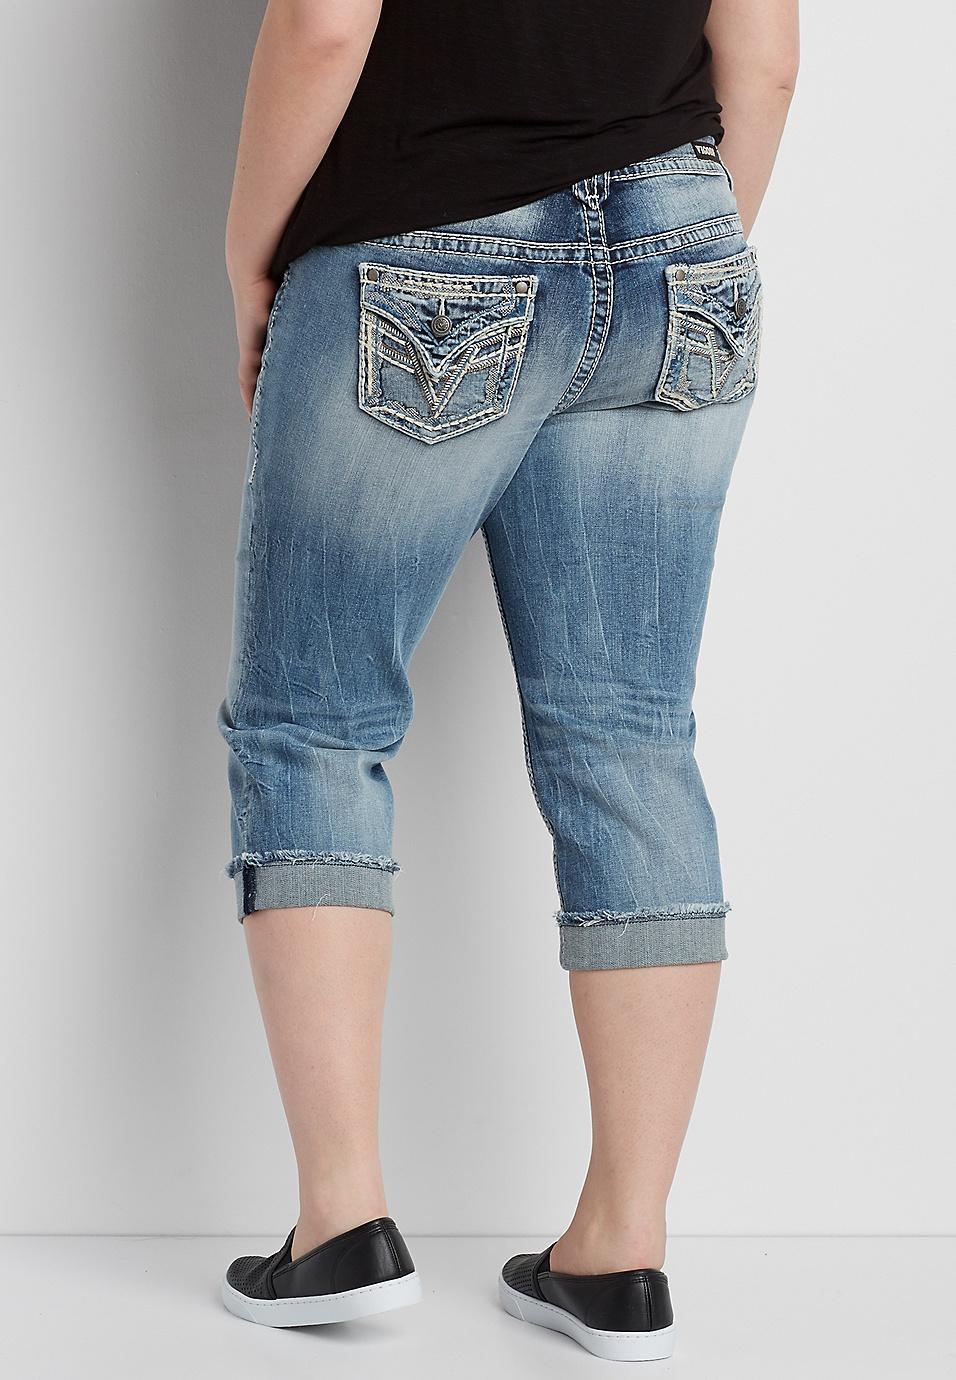 18c9a4bd236 Vigoss® plus size capri with back flap pockets